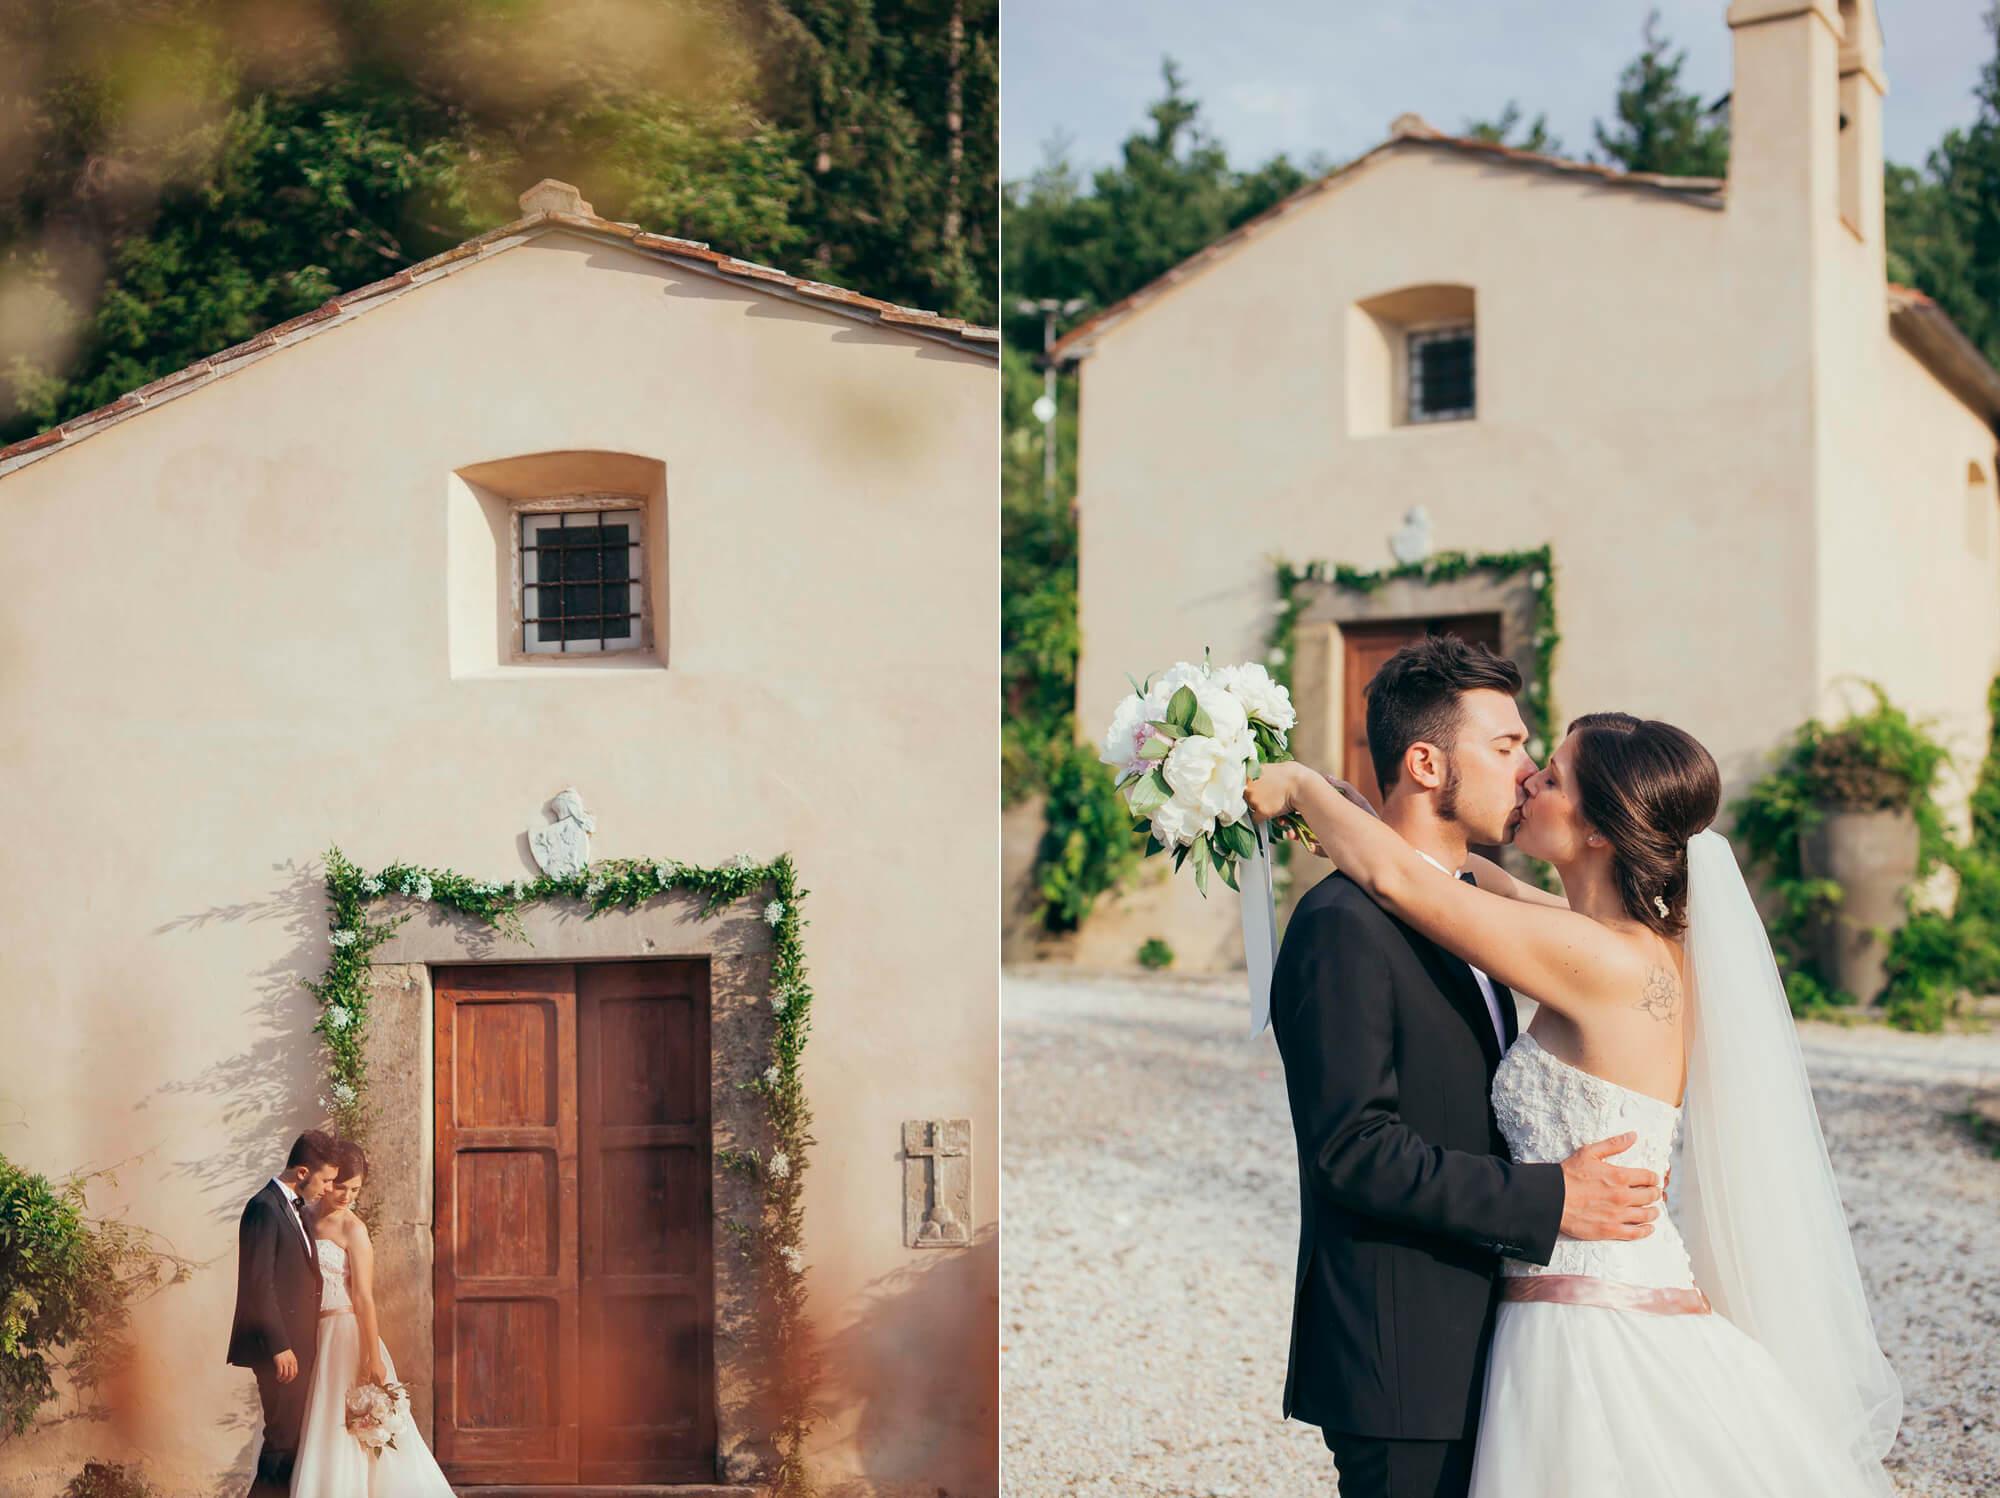 075-arezzo-wedding-photographer.jpg